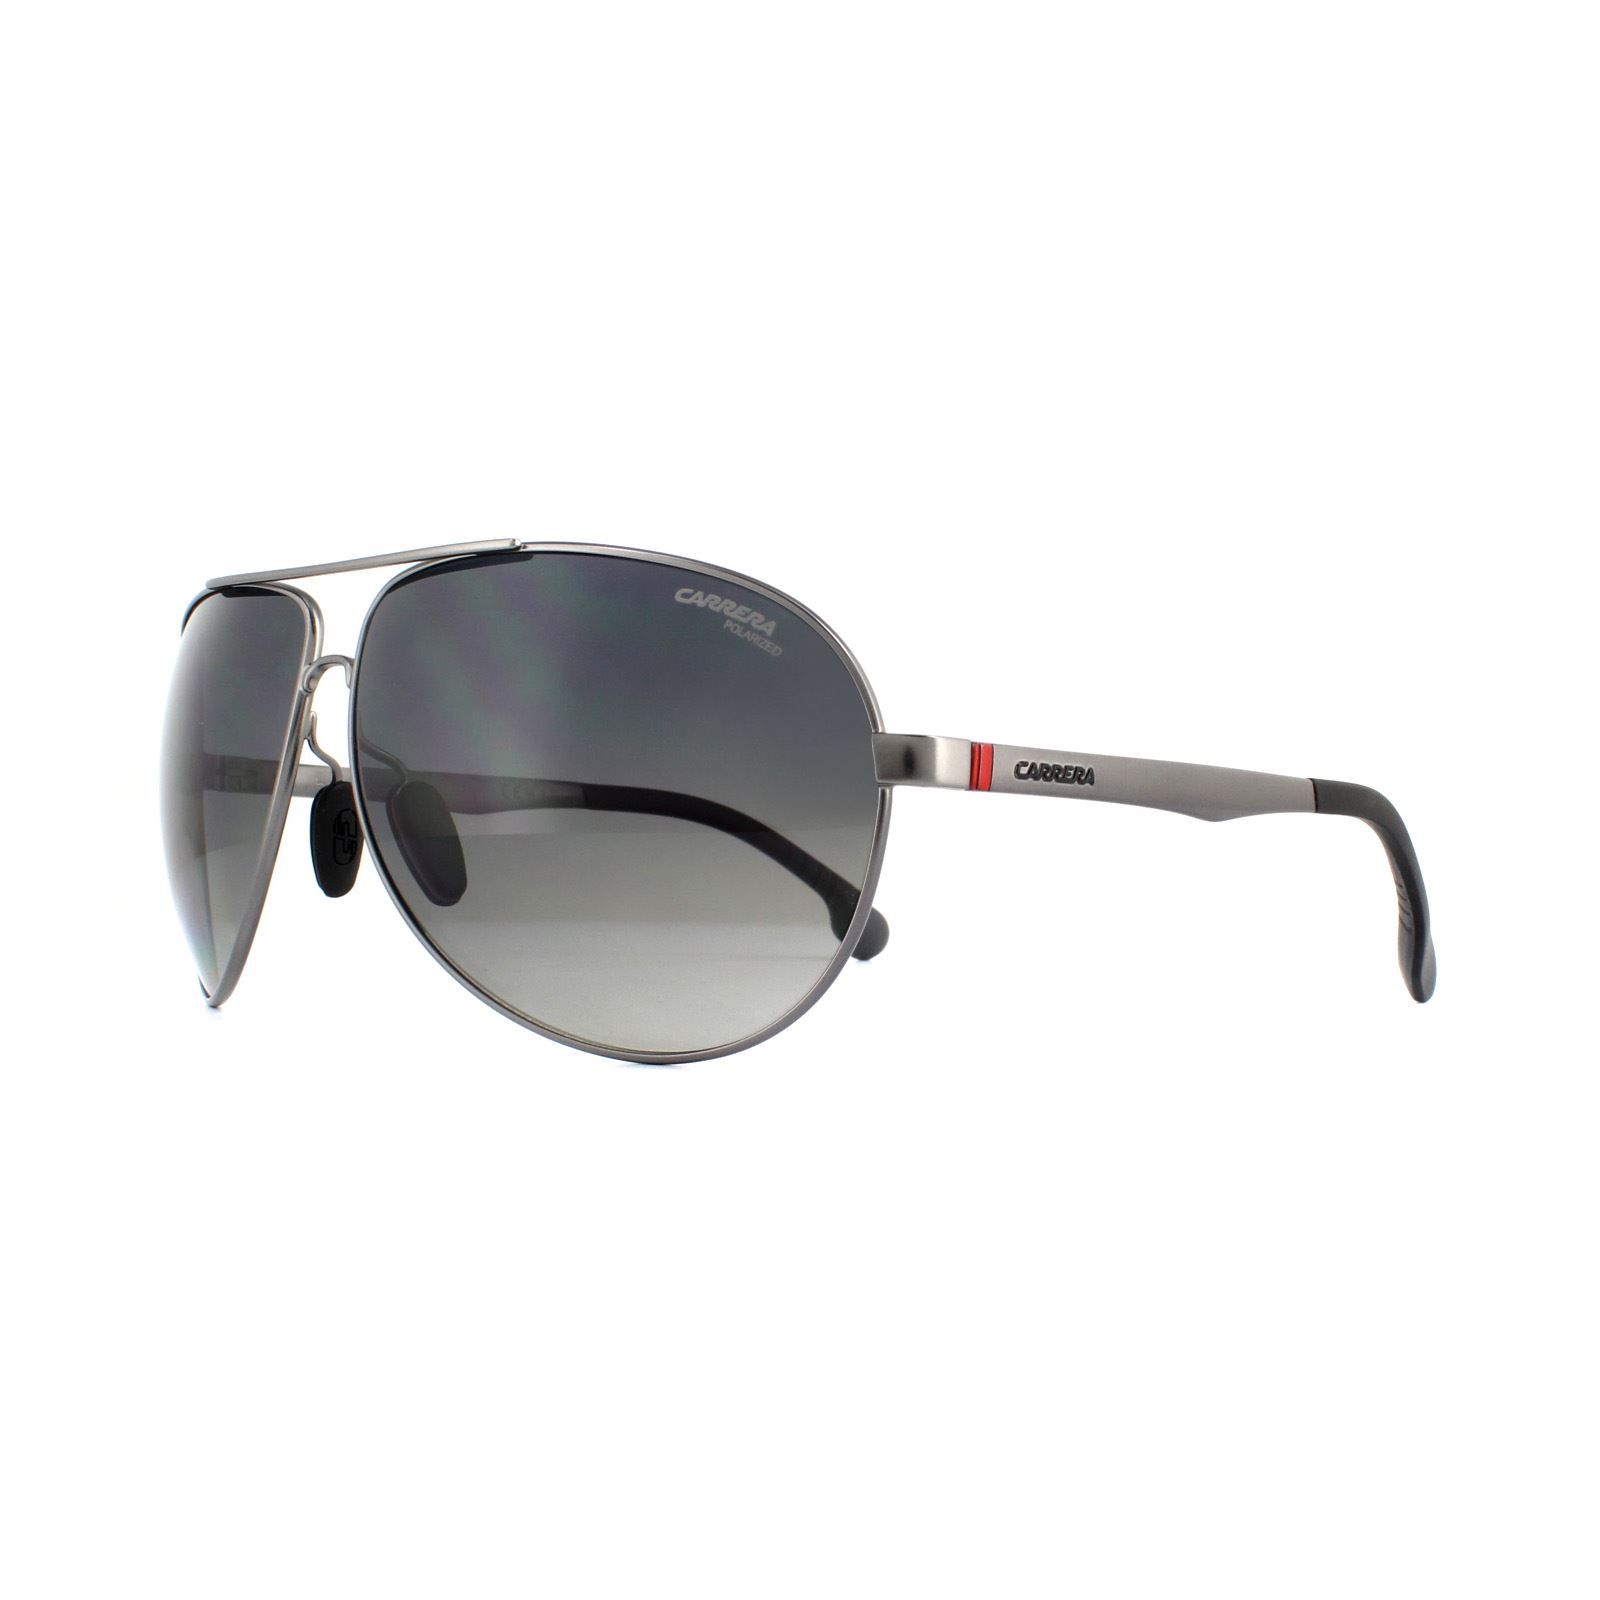 Carrera Sunglasses Carrera 8023 R80 WJ Dark Ruthenium Grey Gradient Polarized